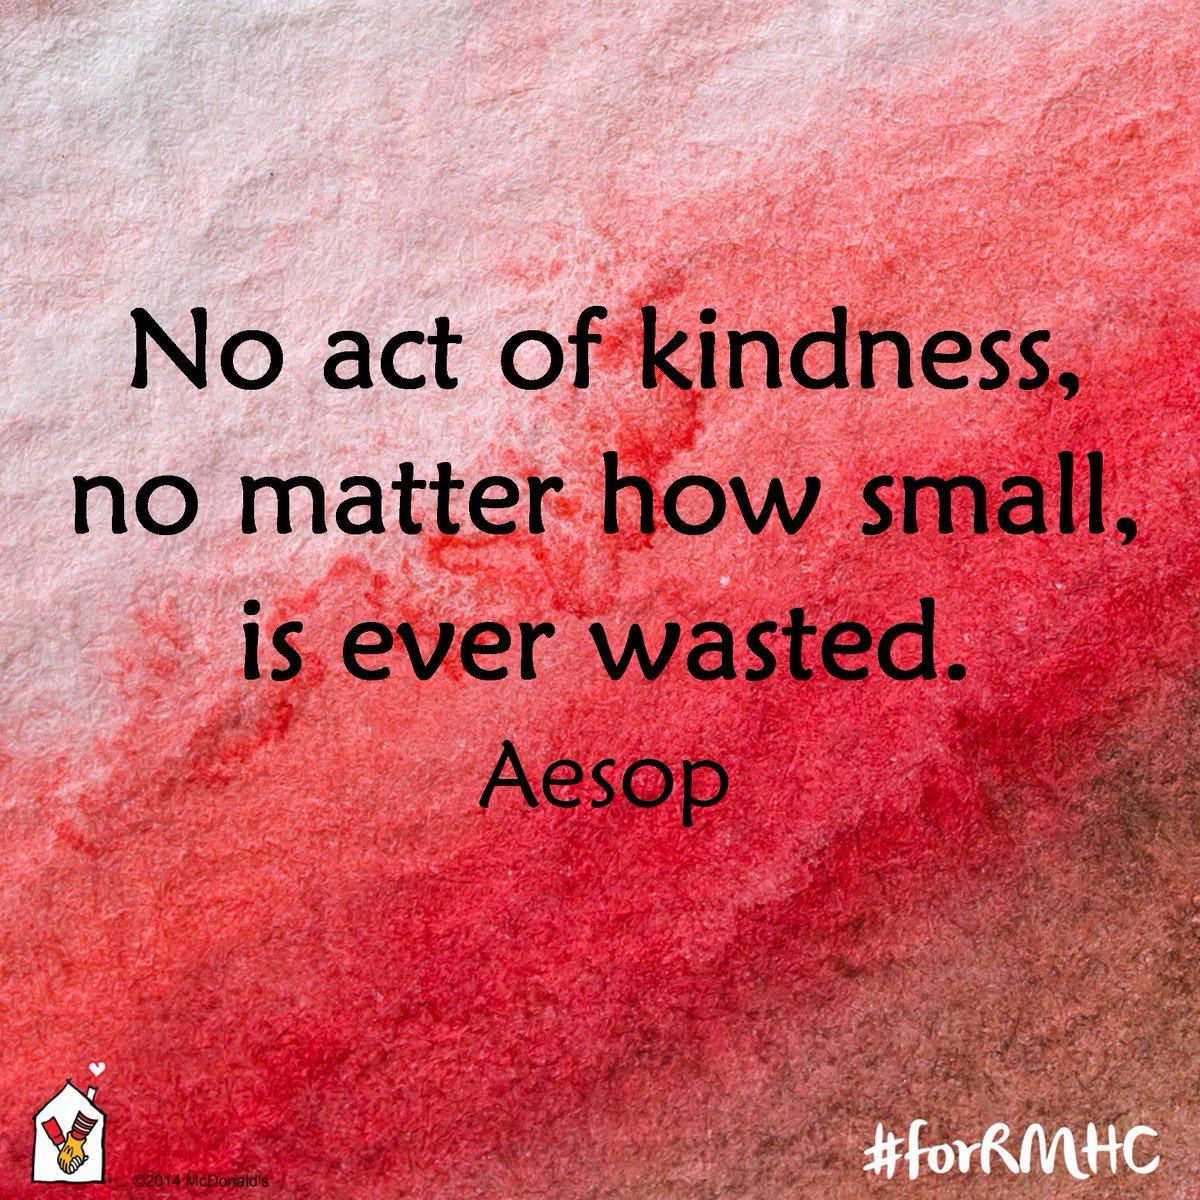 A little act of kindness can go a long way! #RandomActsOfKindnessDay https://t.co/xT3uXLDb3e